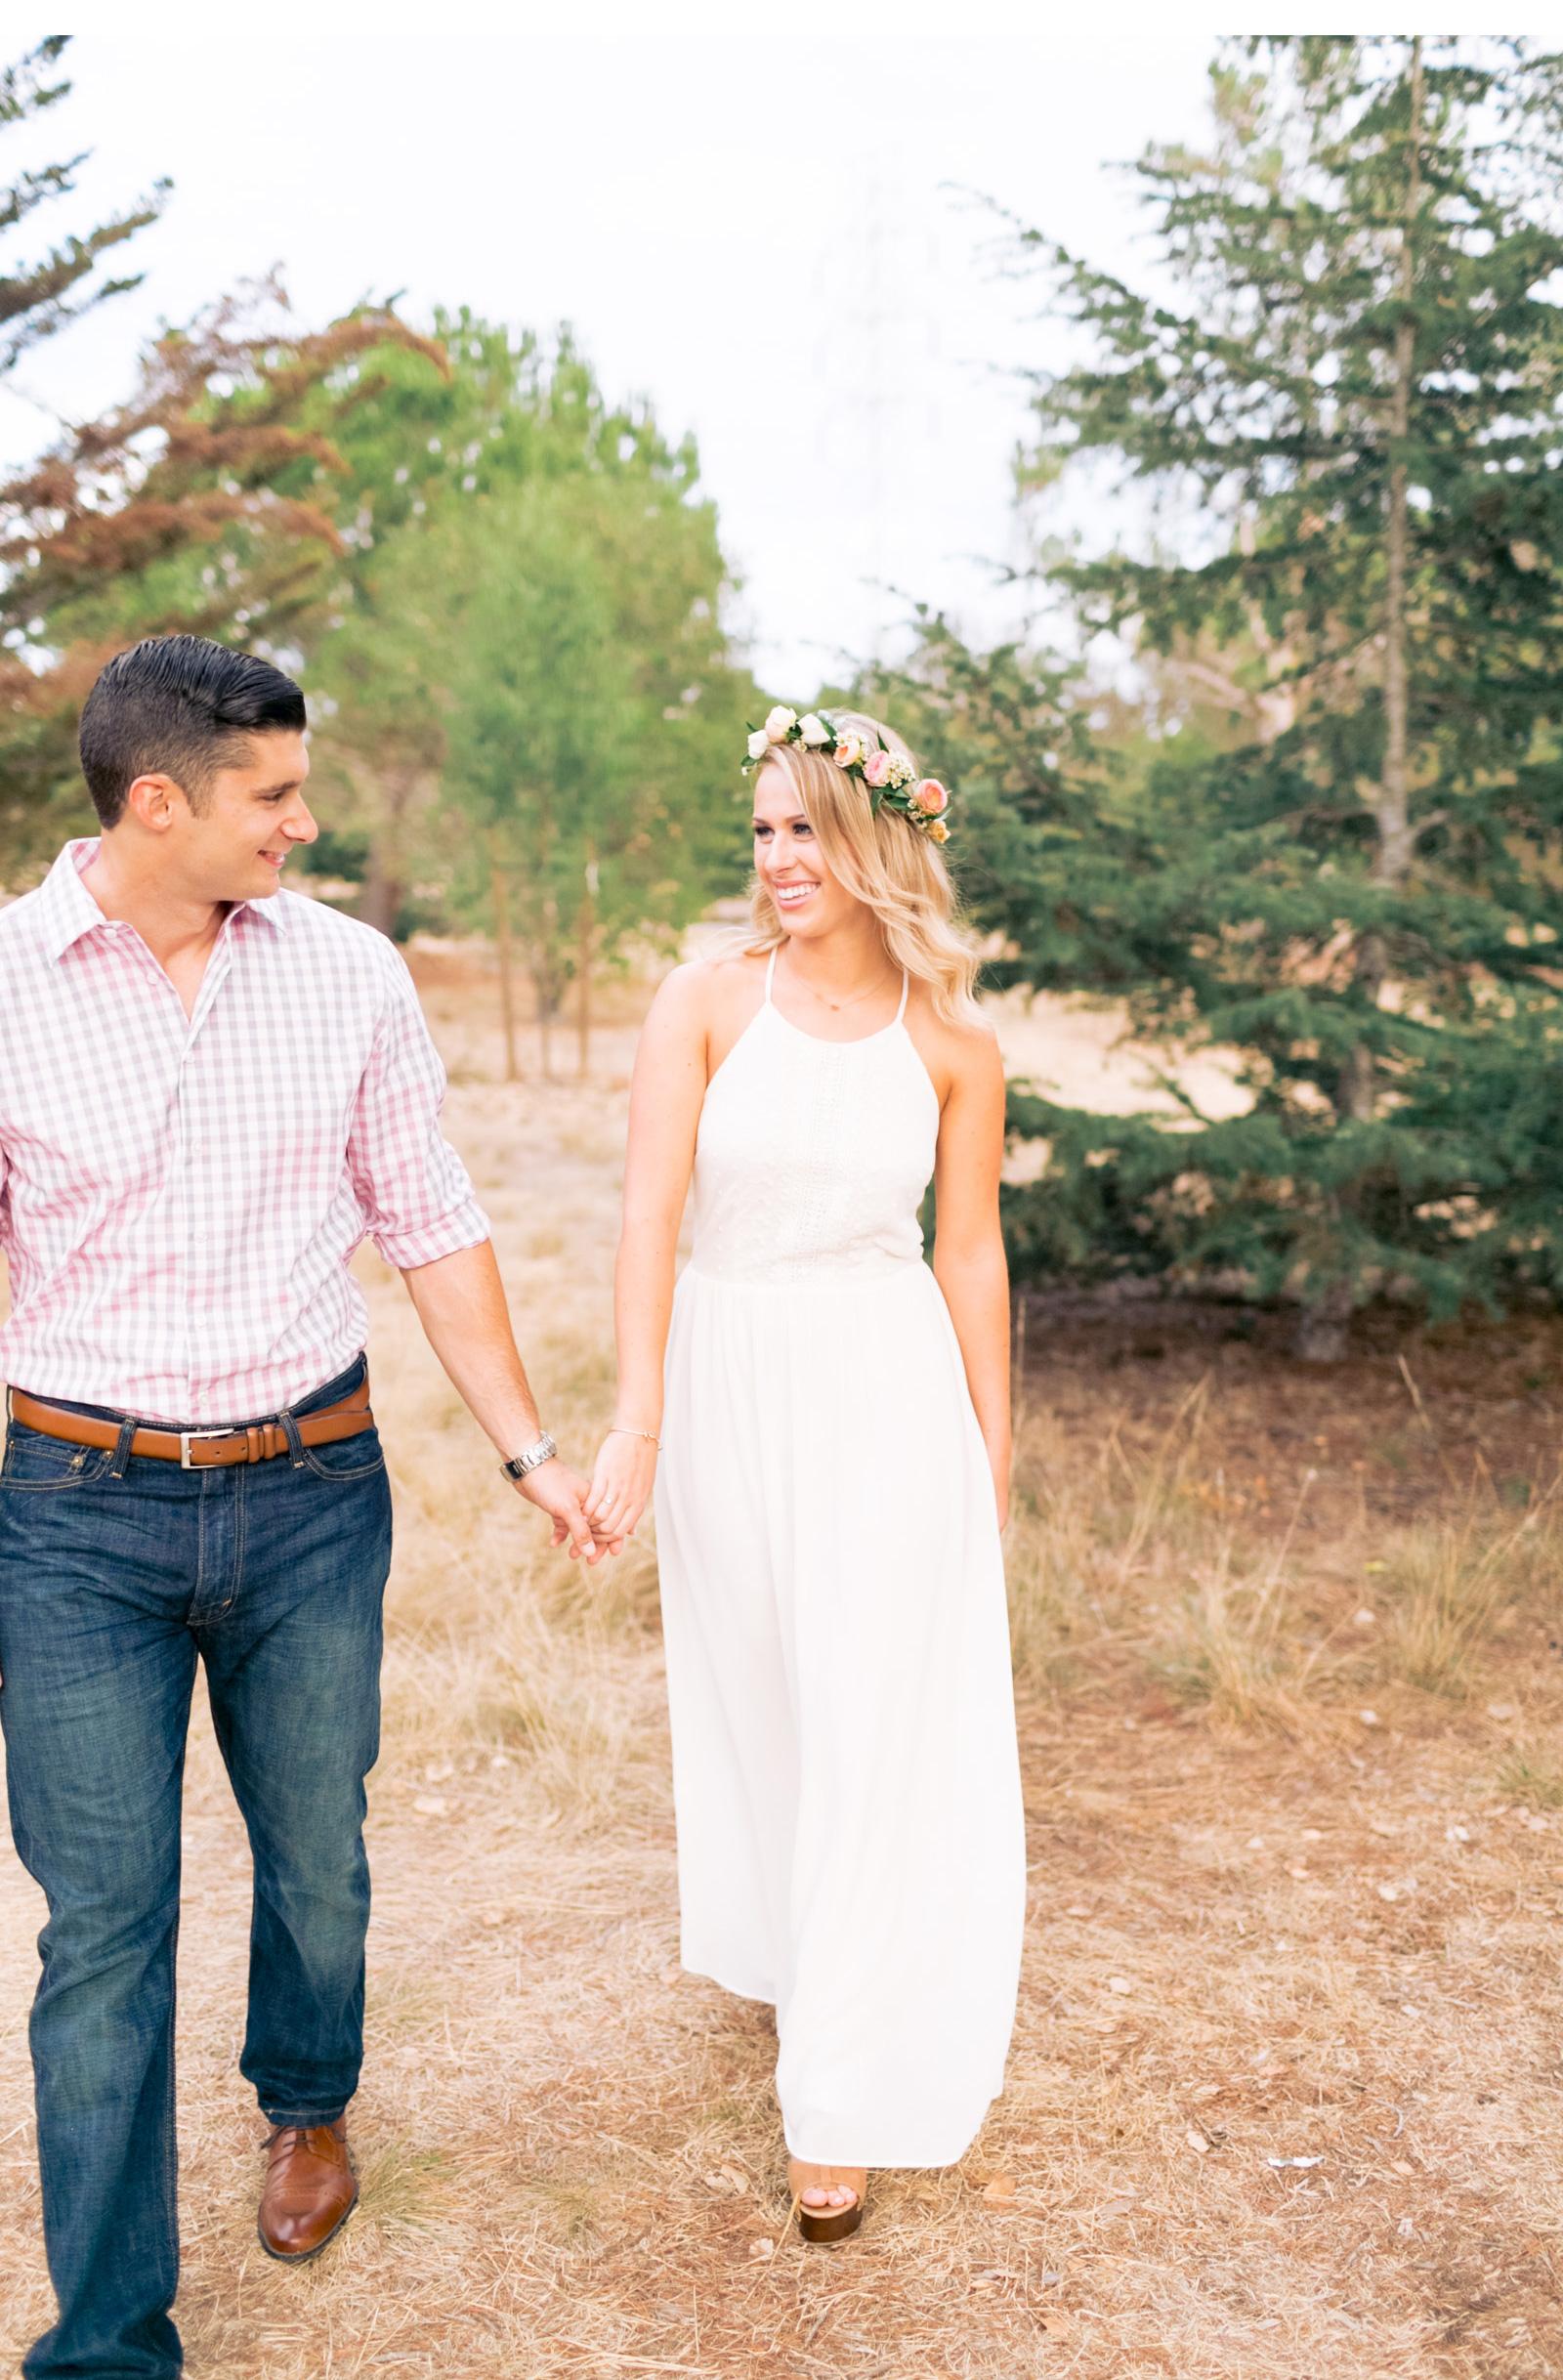 Natalie-Schutt-Photography---San-Luis-Obispo-Wedding-Photographer_04.jpg